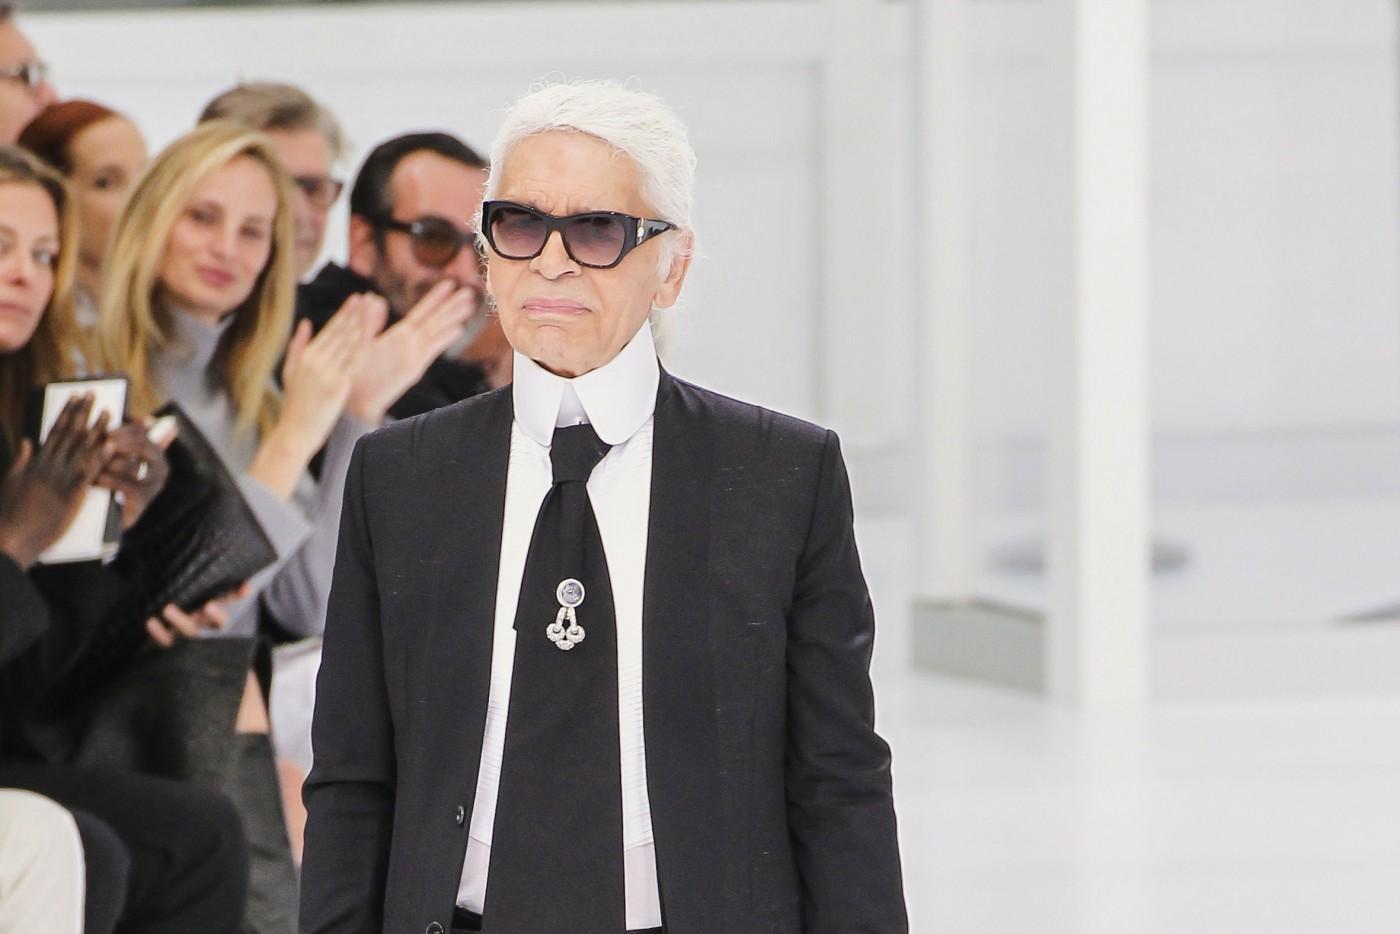 Even Karl Lagerfeld Gets Nostalgic Prom Feels